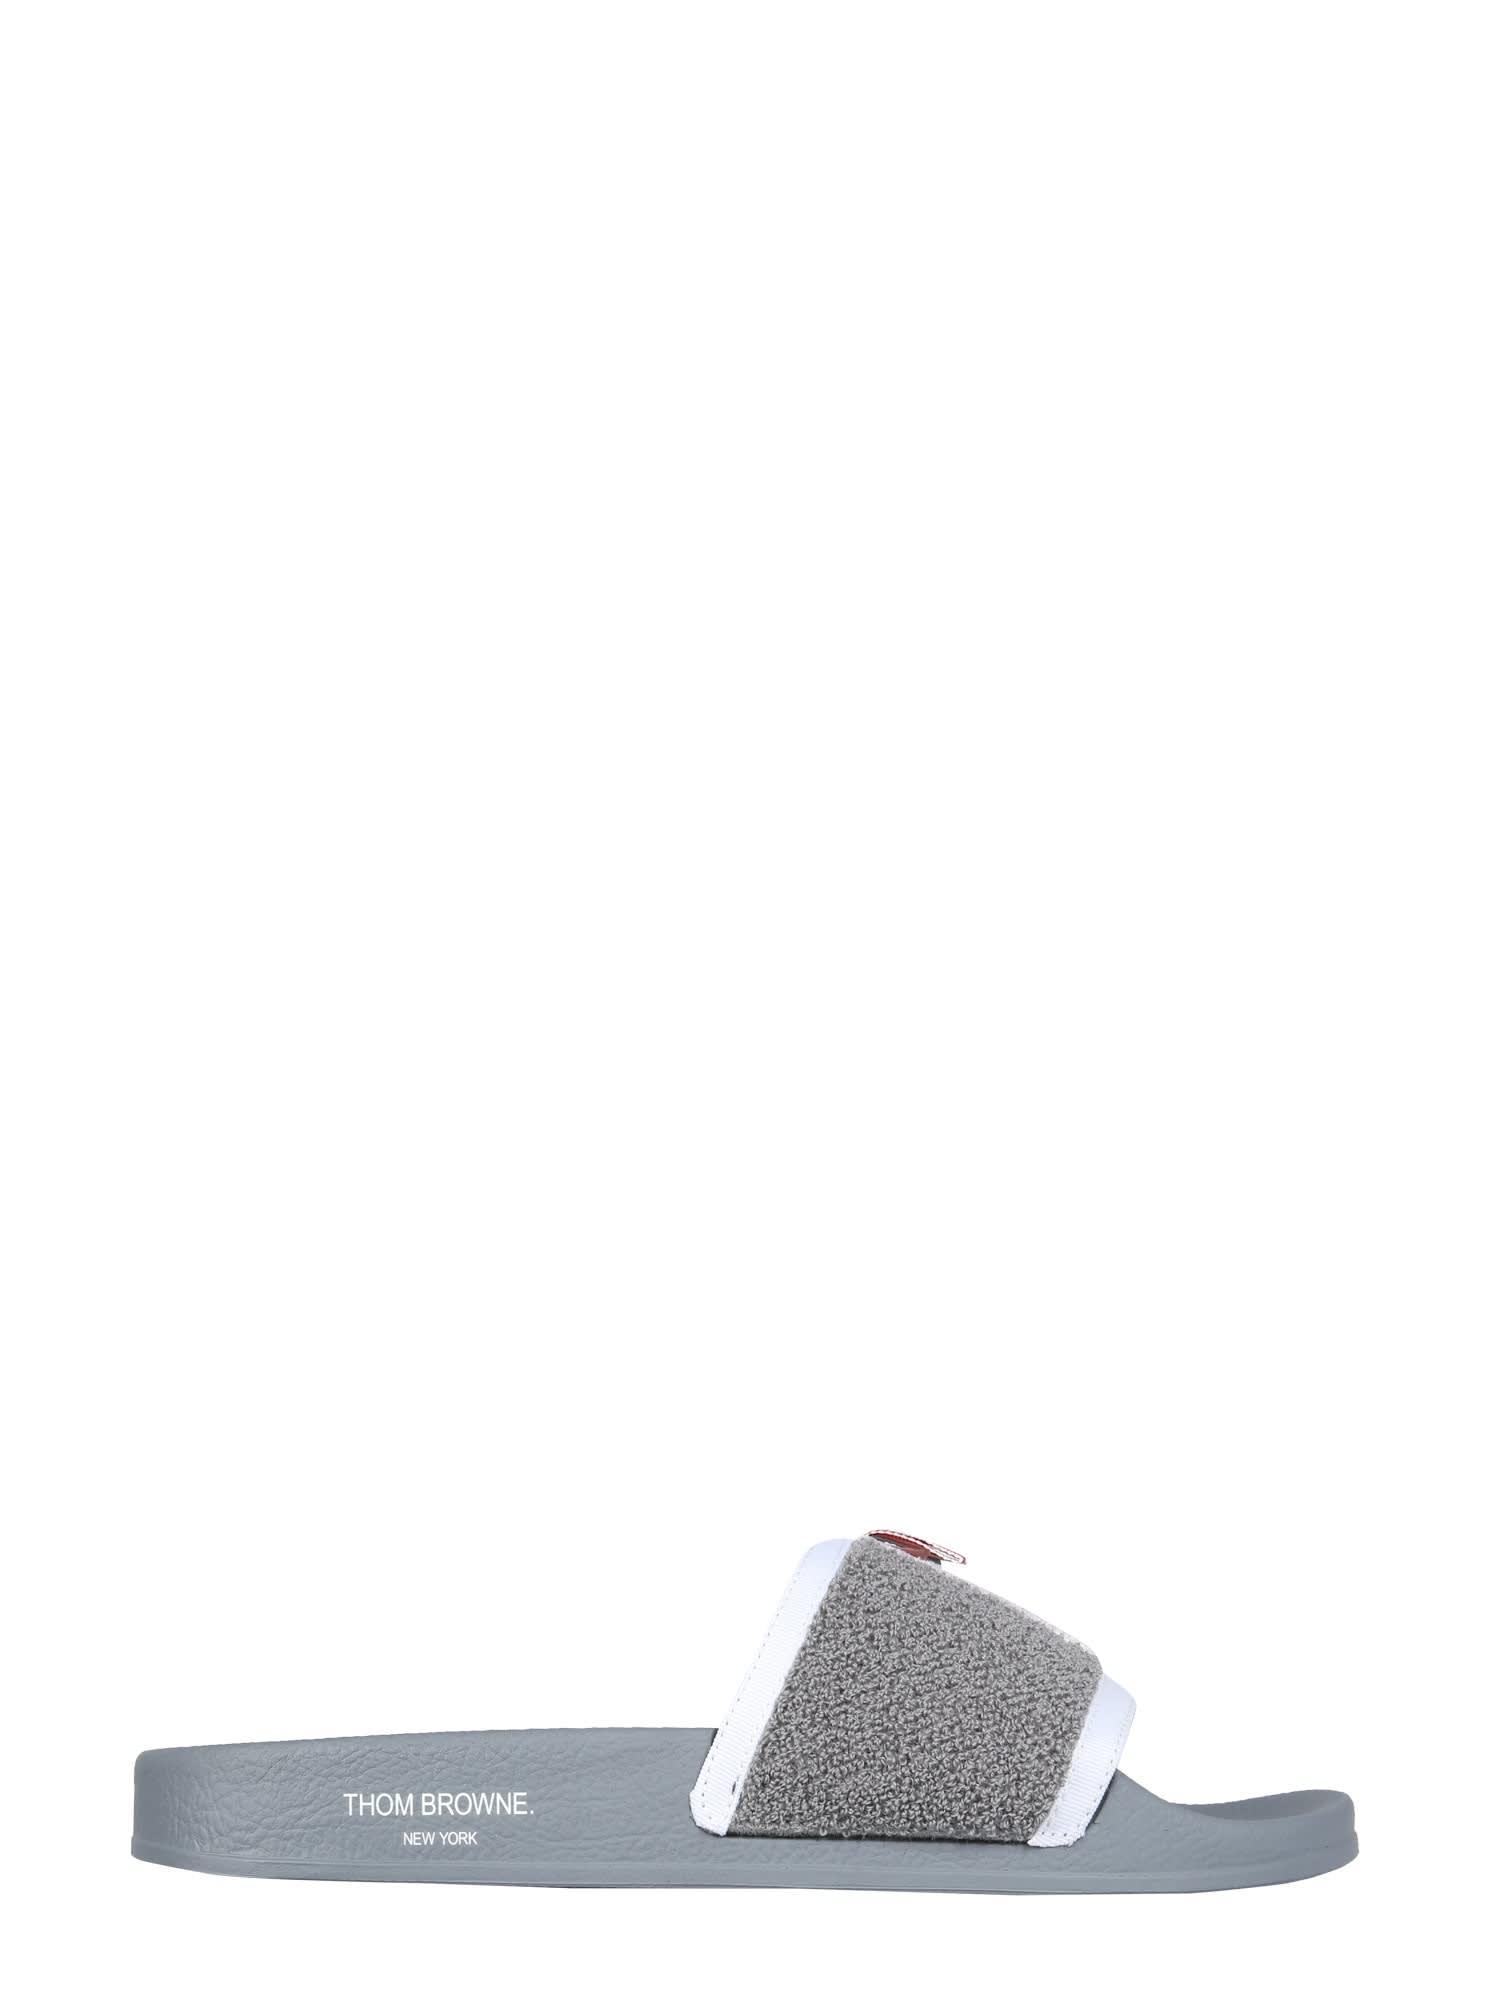 Thom Browne SPONGE SLIDE SANDALS